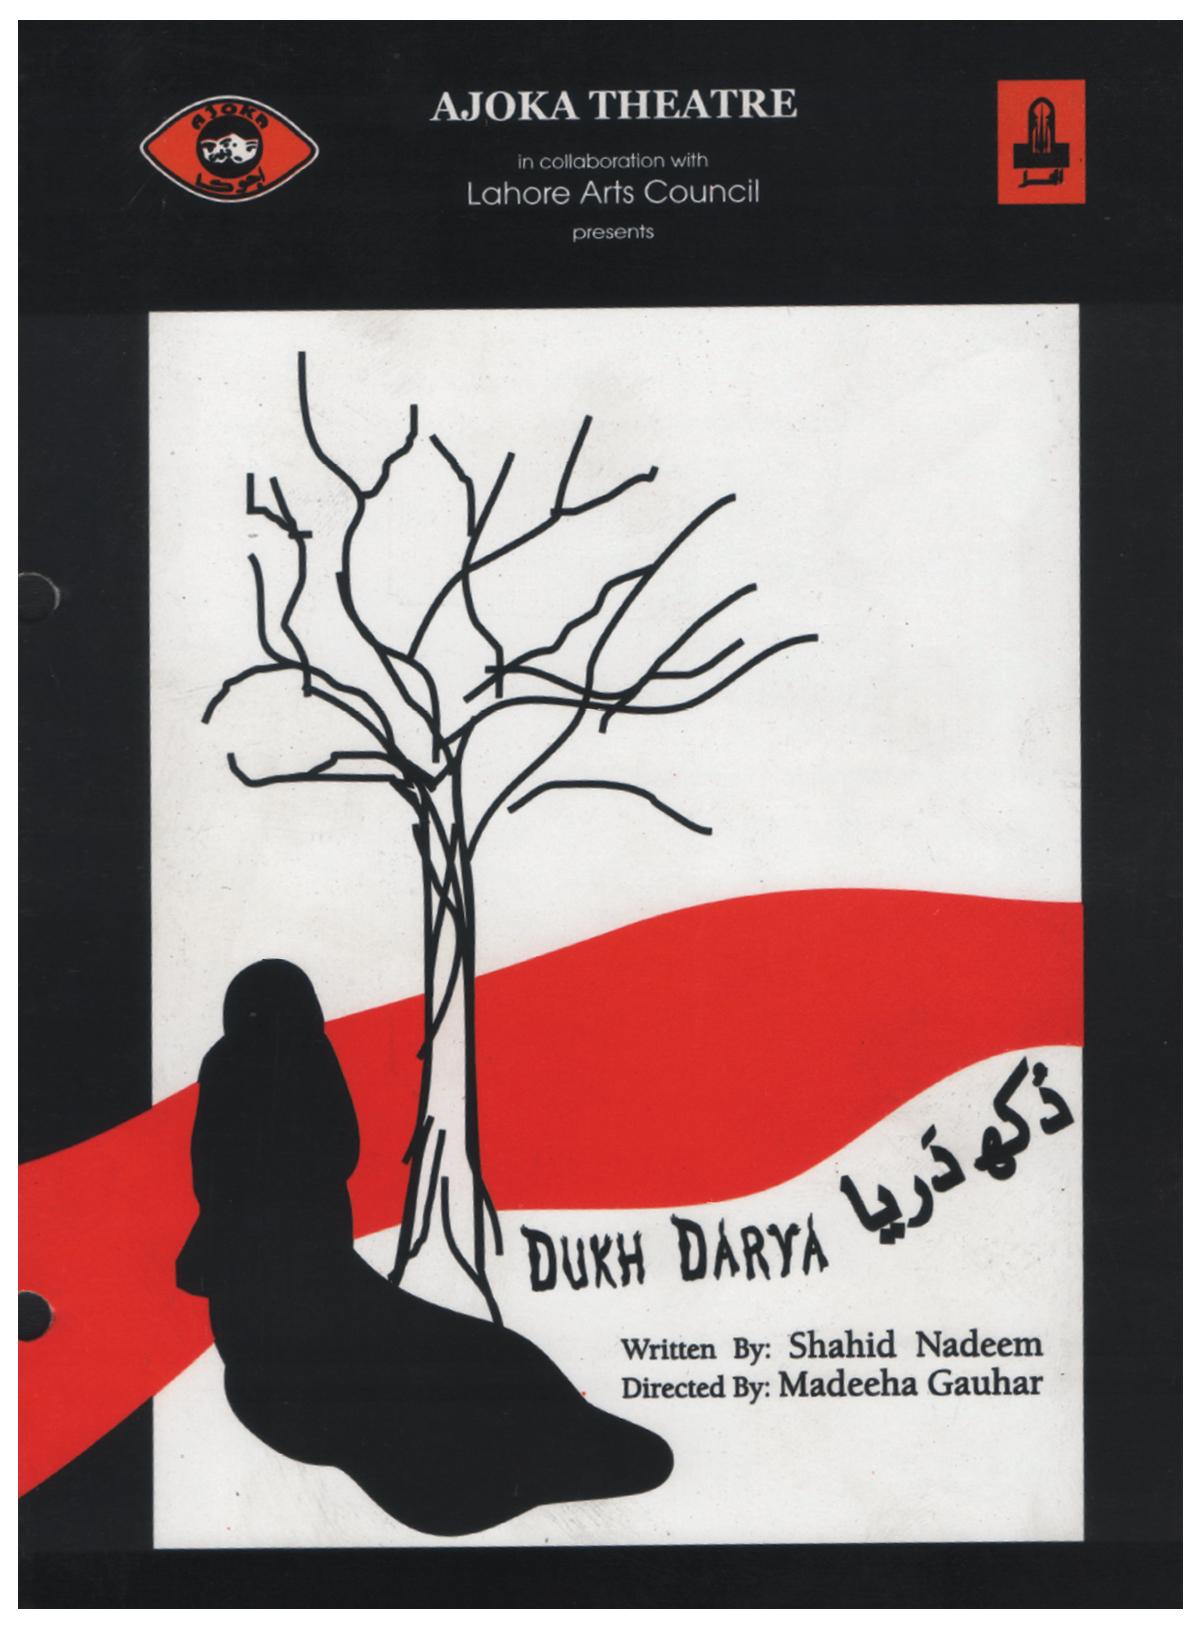 DUKH DYRAA